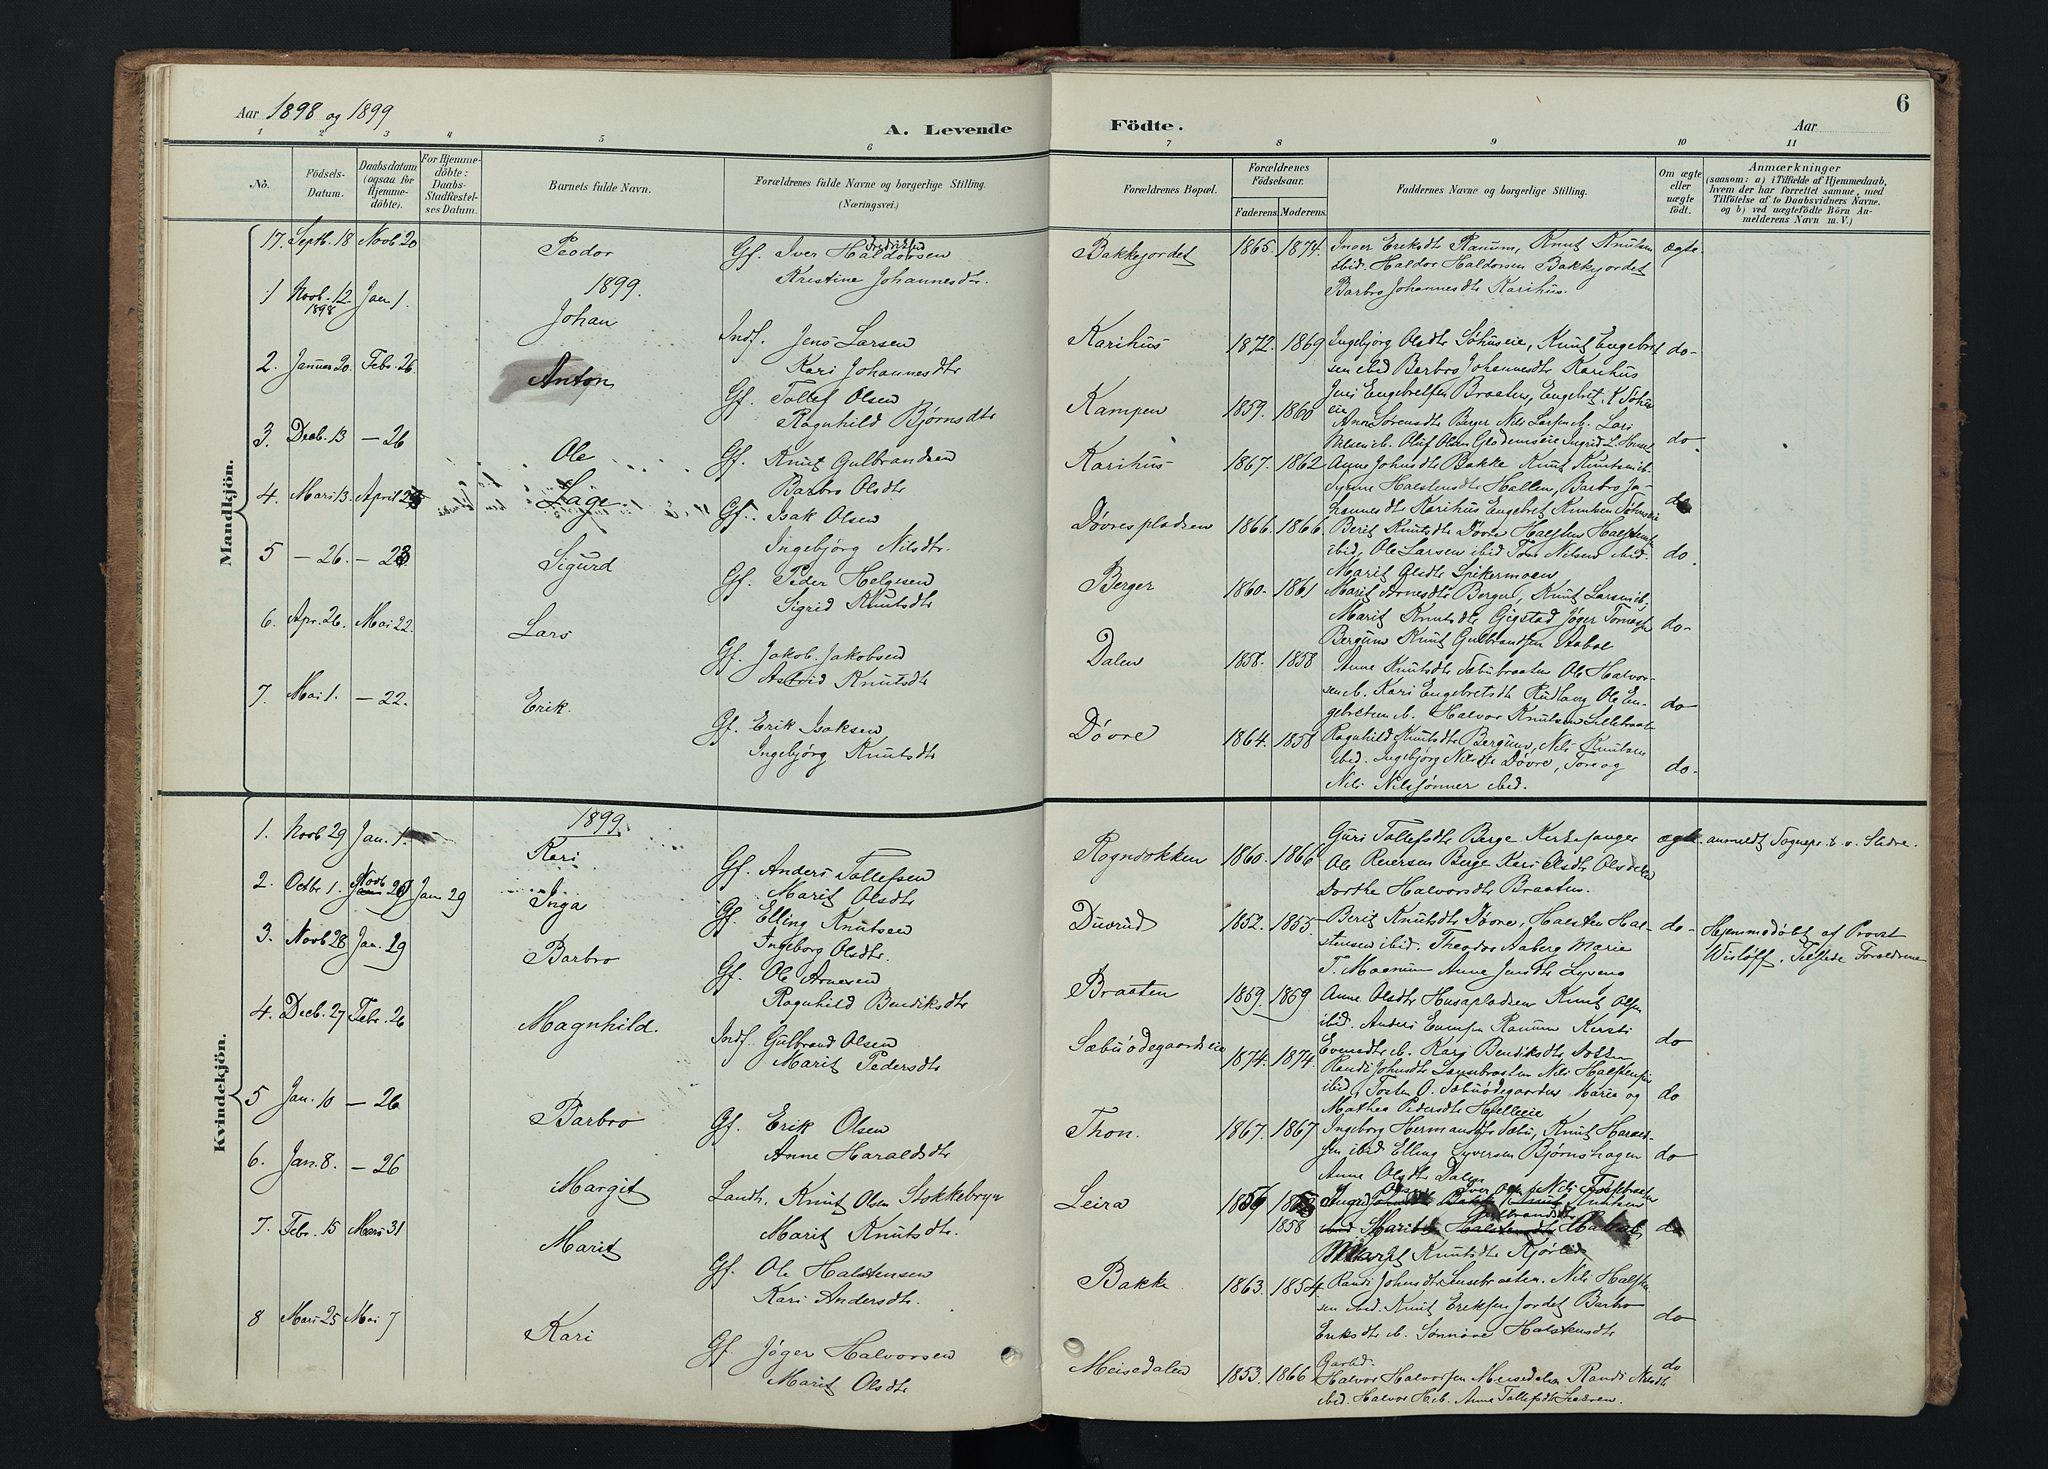 SAH, Nord-Aurdal prestekontor, Ministerialbok nr. 15, 1896-1914, s. 6